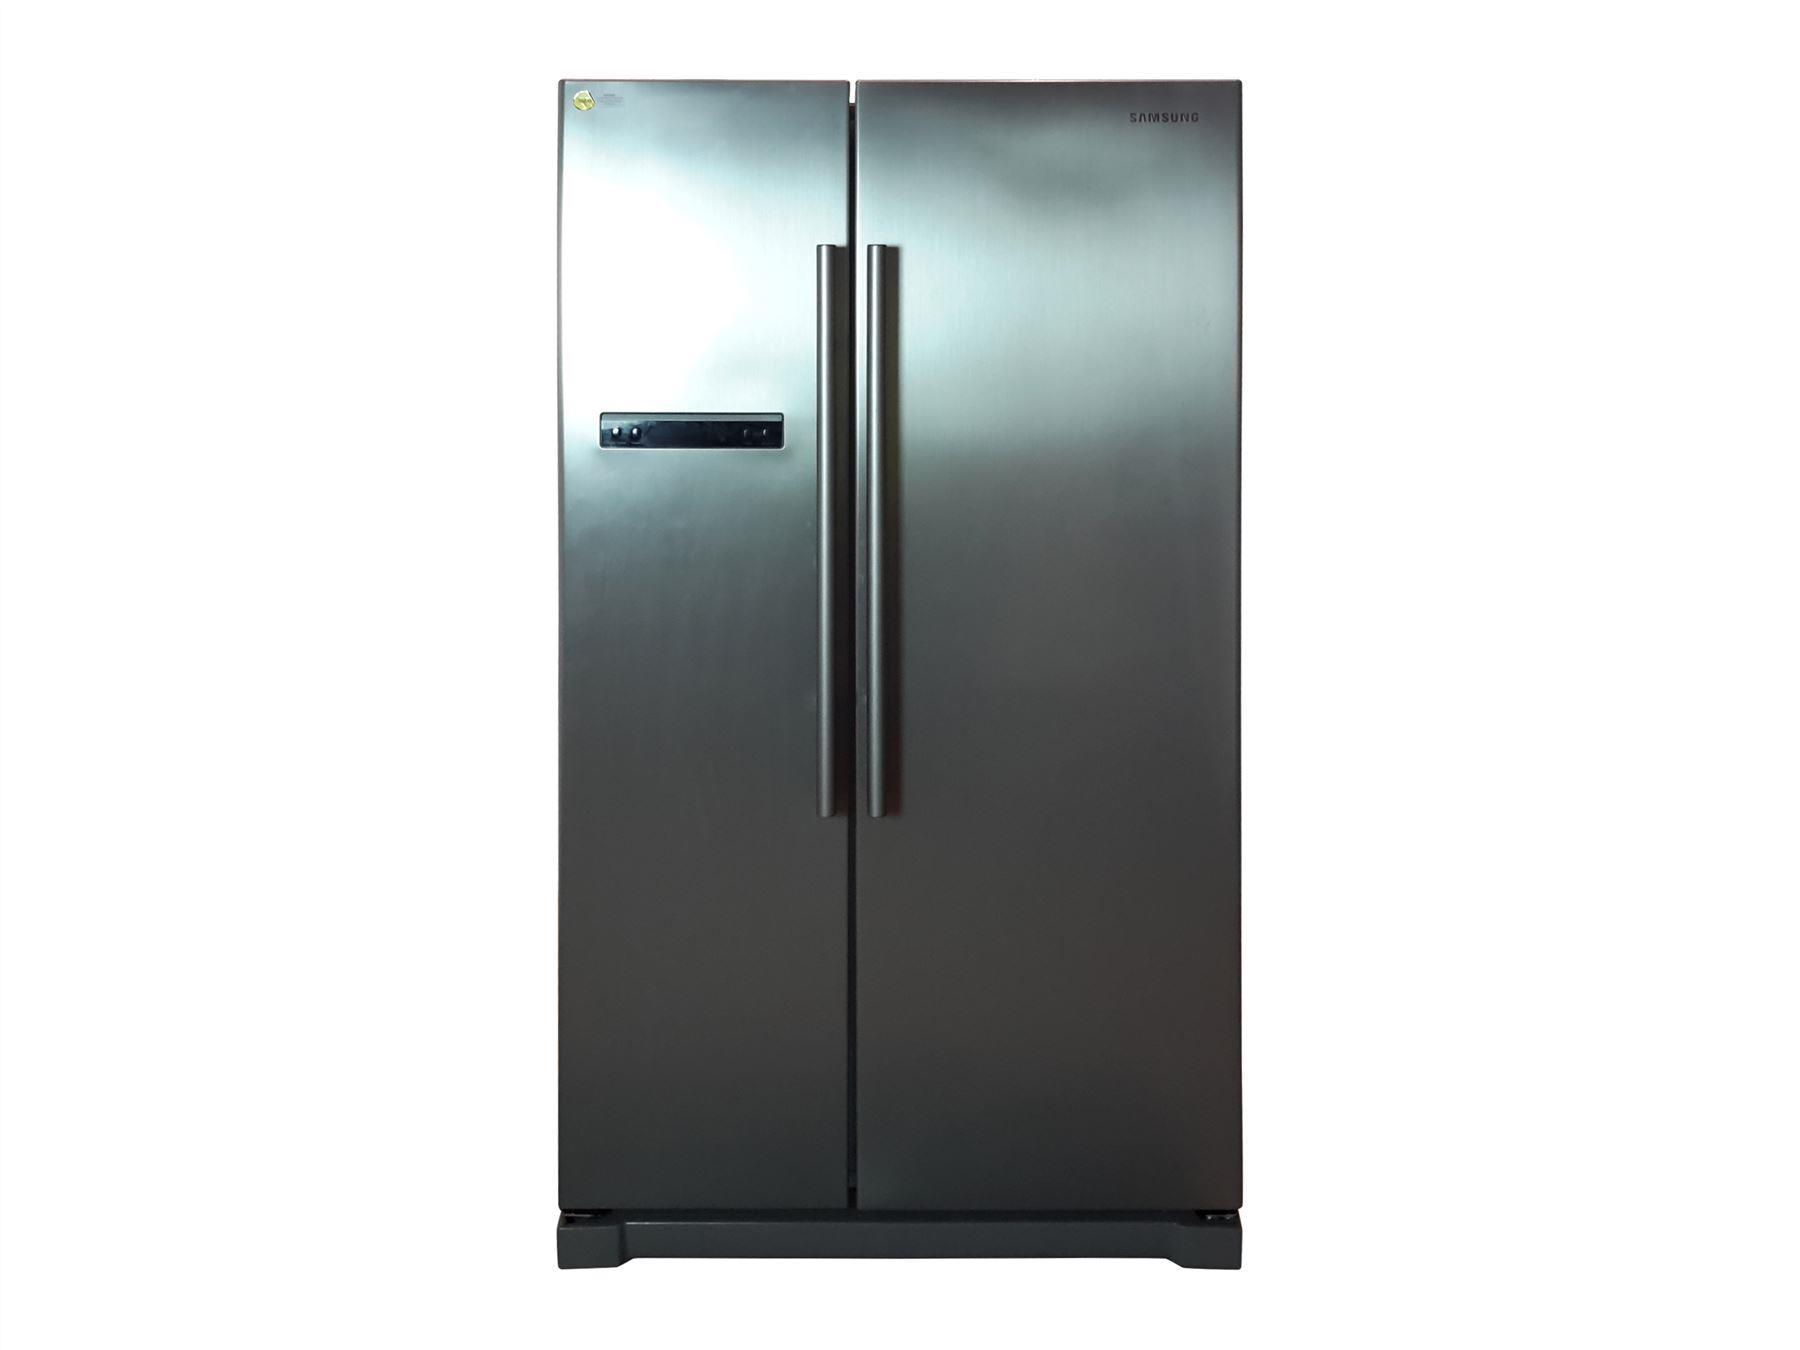 Samsung Rsa1nhvg American Fridge Freezer Online Store